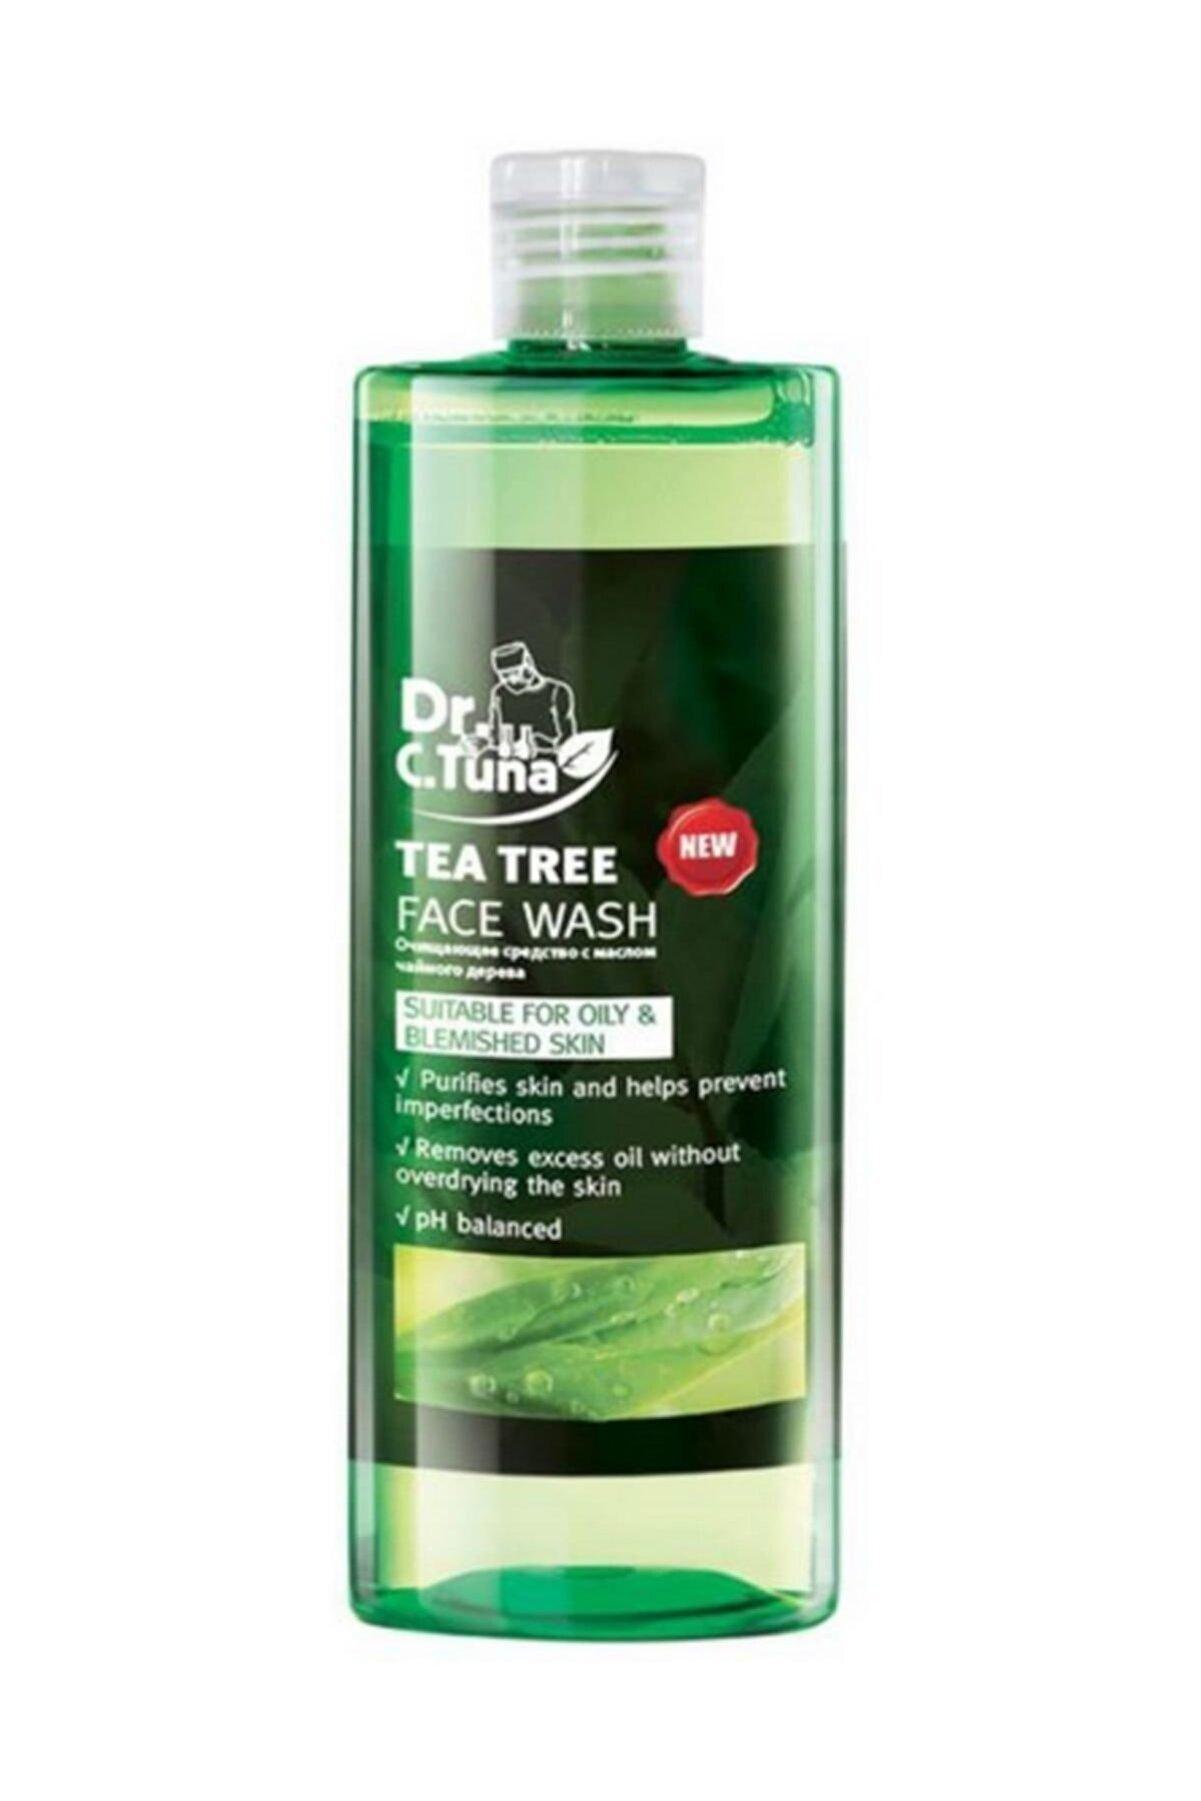 Farmasi Dr.c. Tuna Çay Ağacı Yağlı Yüz Yıkama Jeli 225 ml